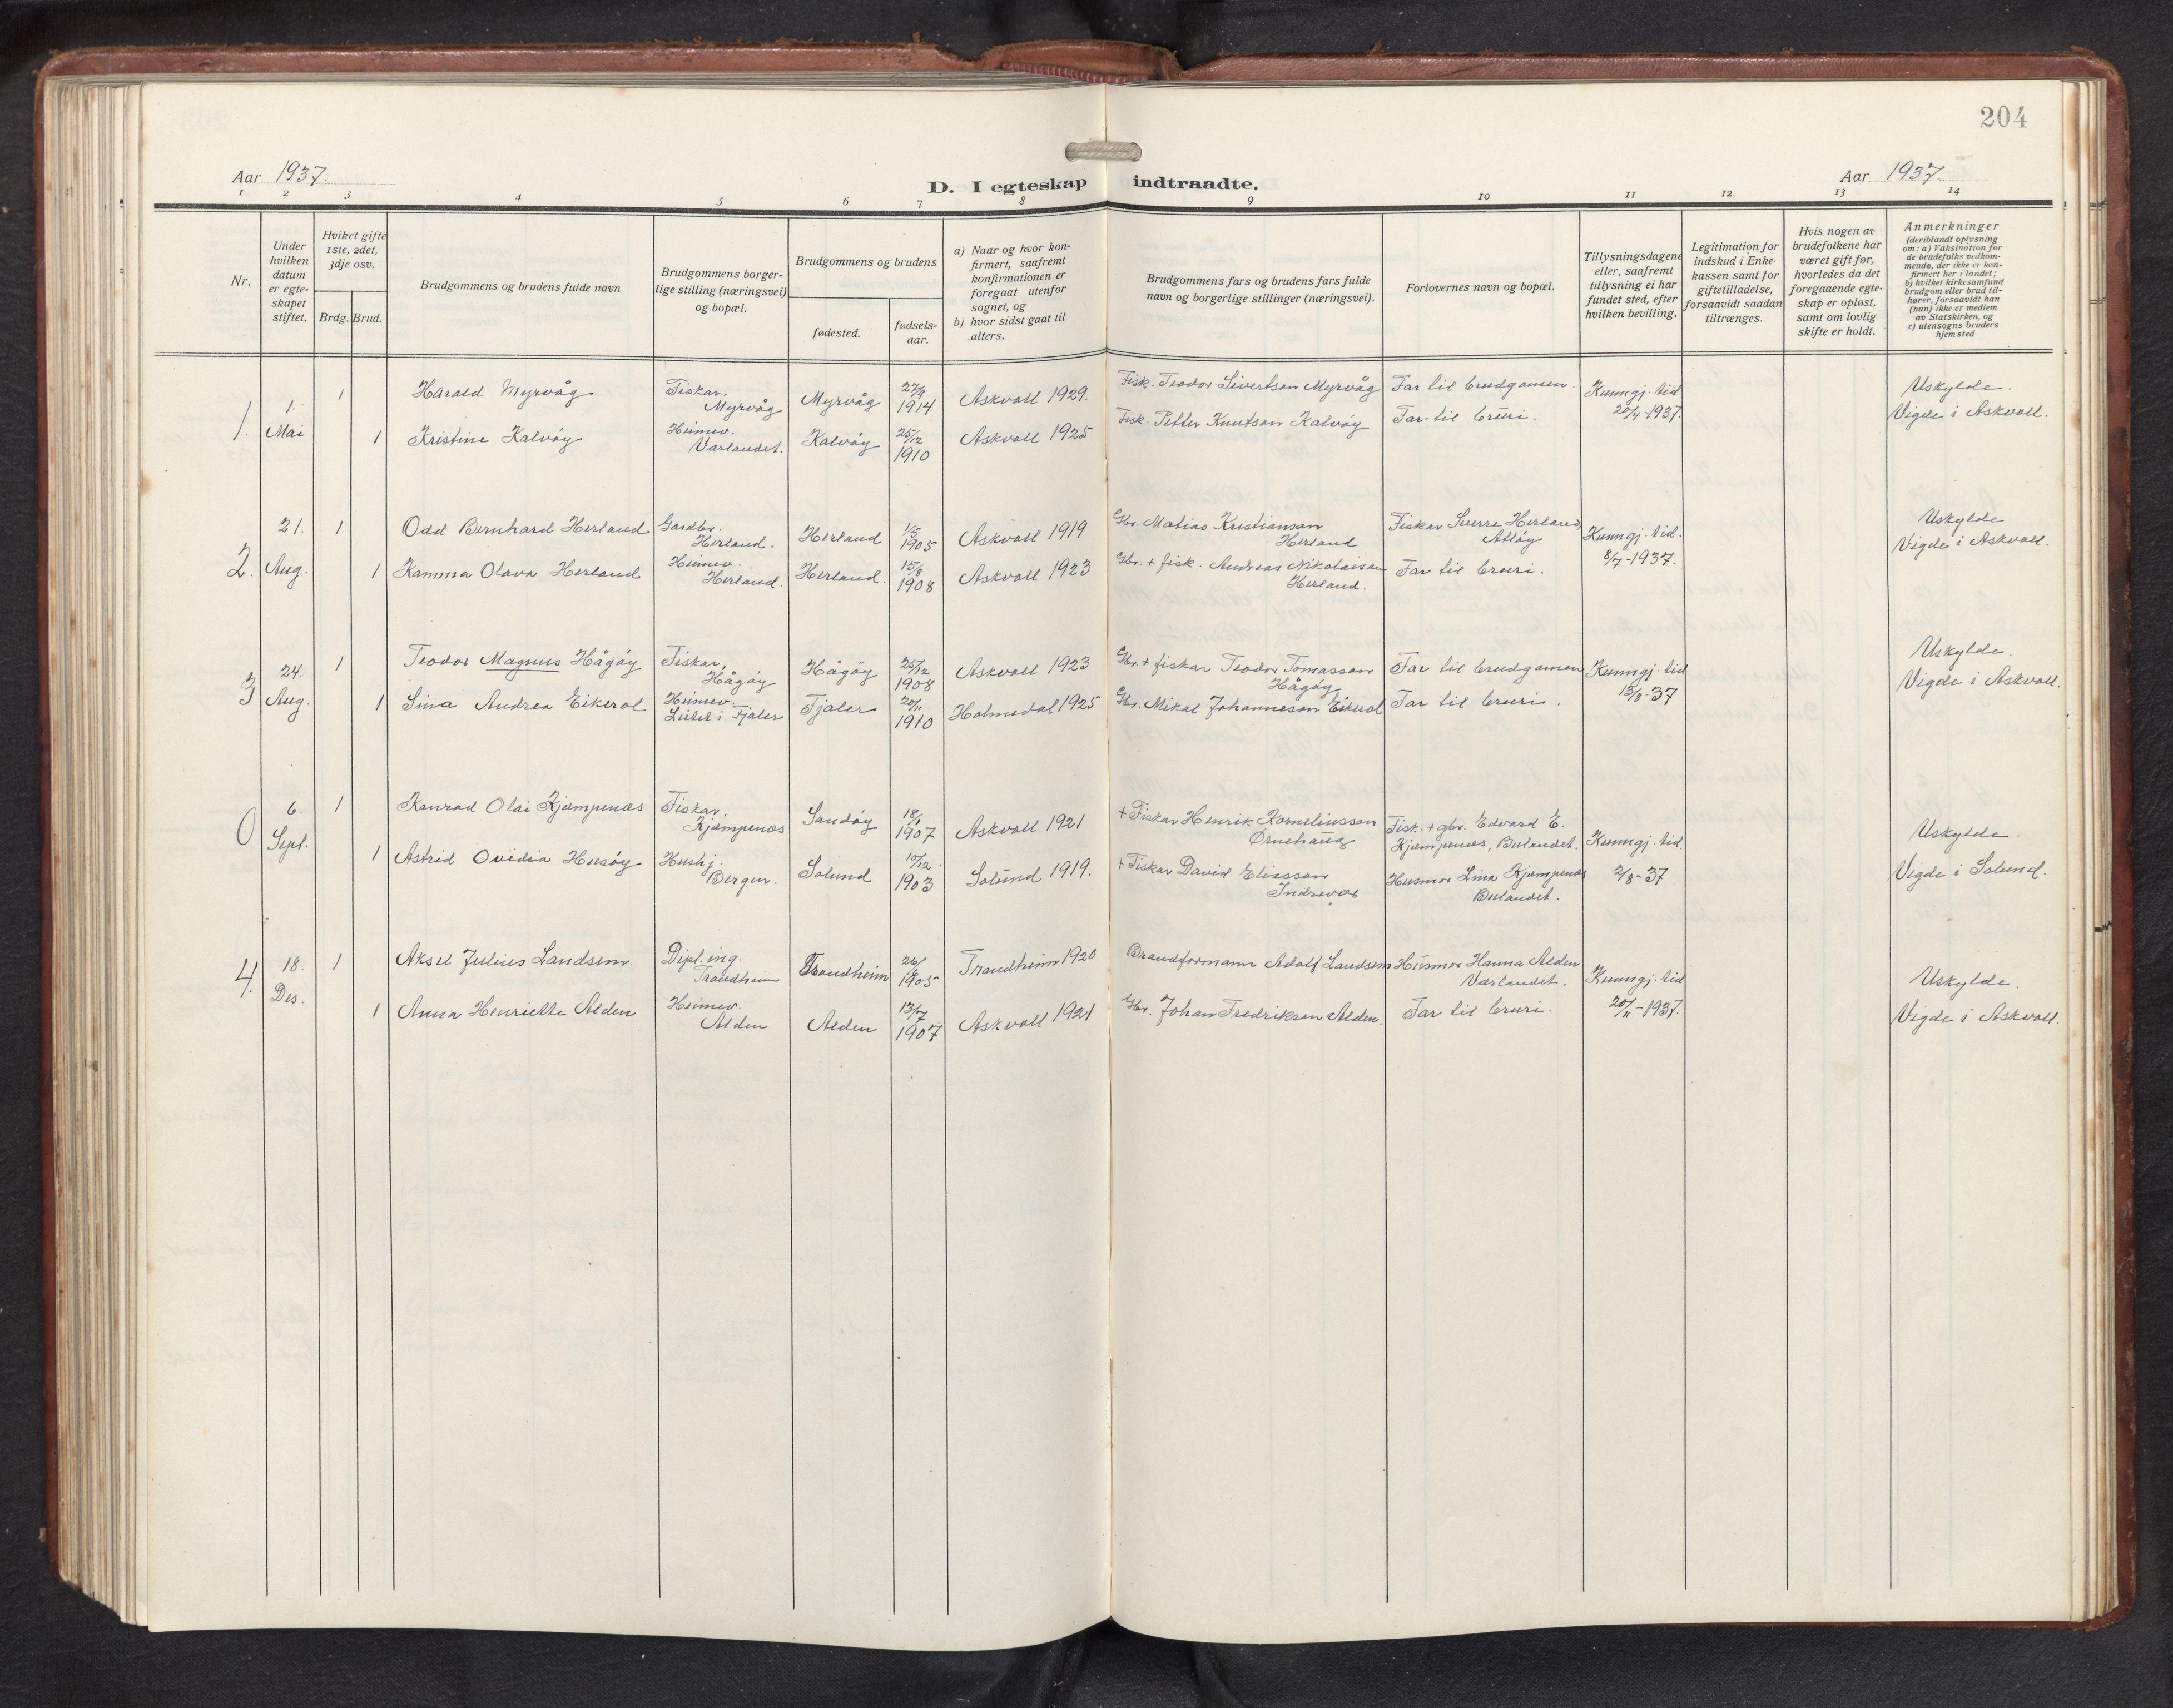 SAB, Askvoll sokneprestembete, H/Hab/Habb/L0002: Klokkerbok nr. B 2, 1910-1947, s. 203b-204a